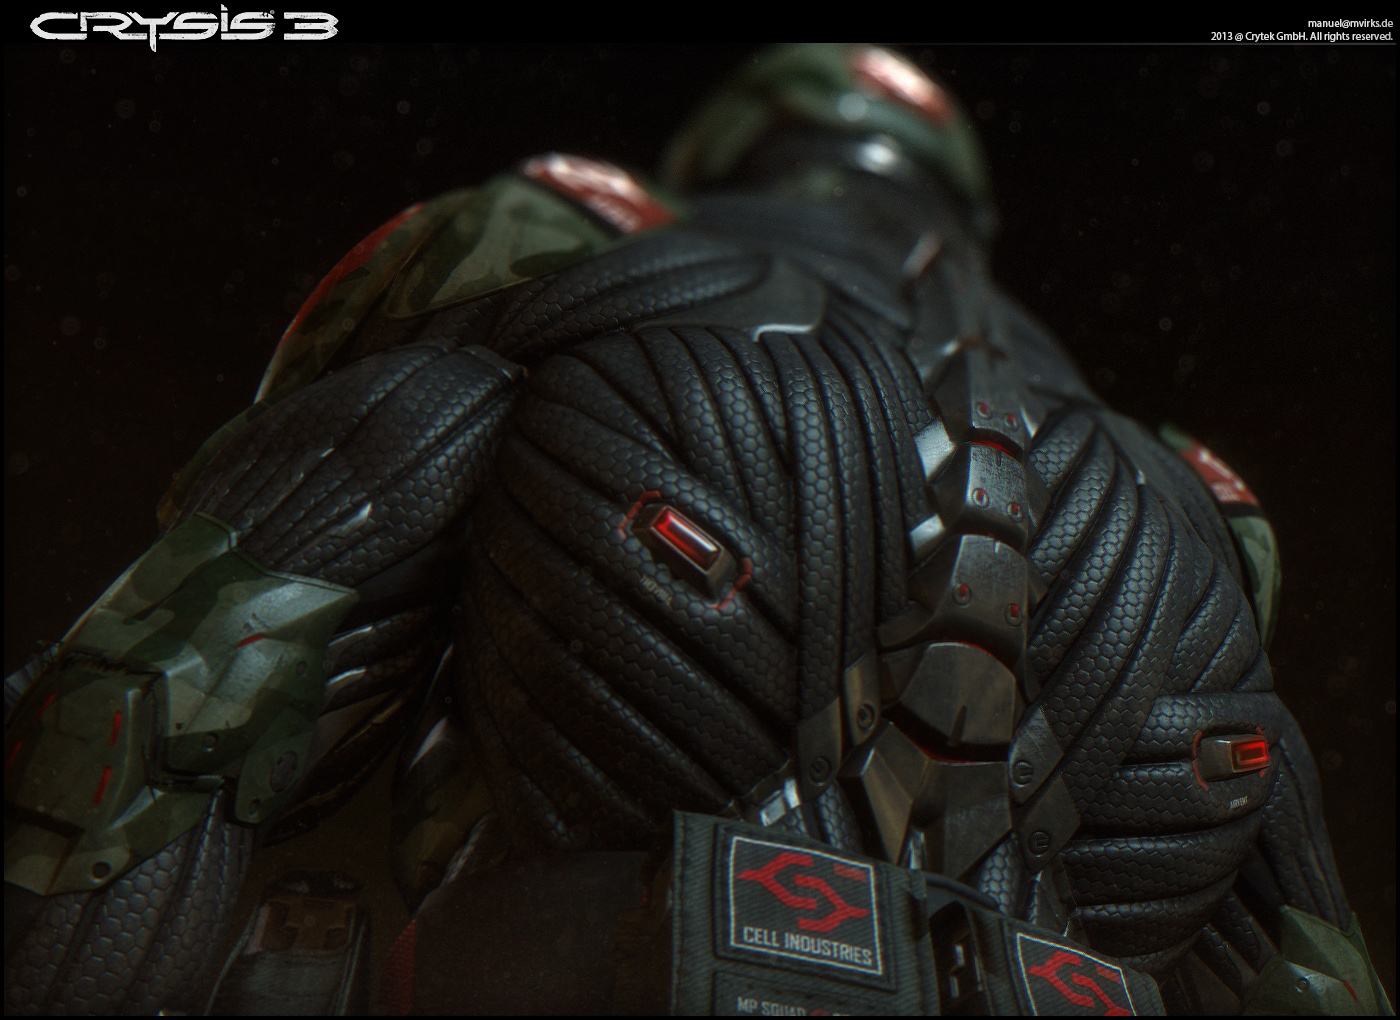 Character Crysis 3 Nanosuit Mp Amp Alien Helmet Manuel